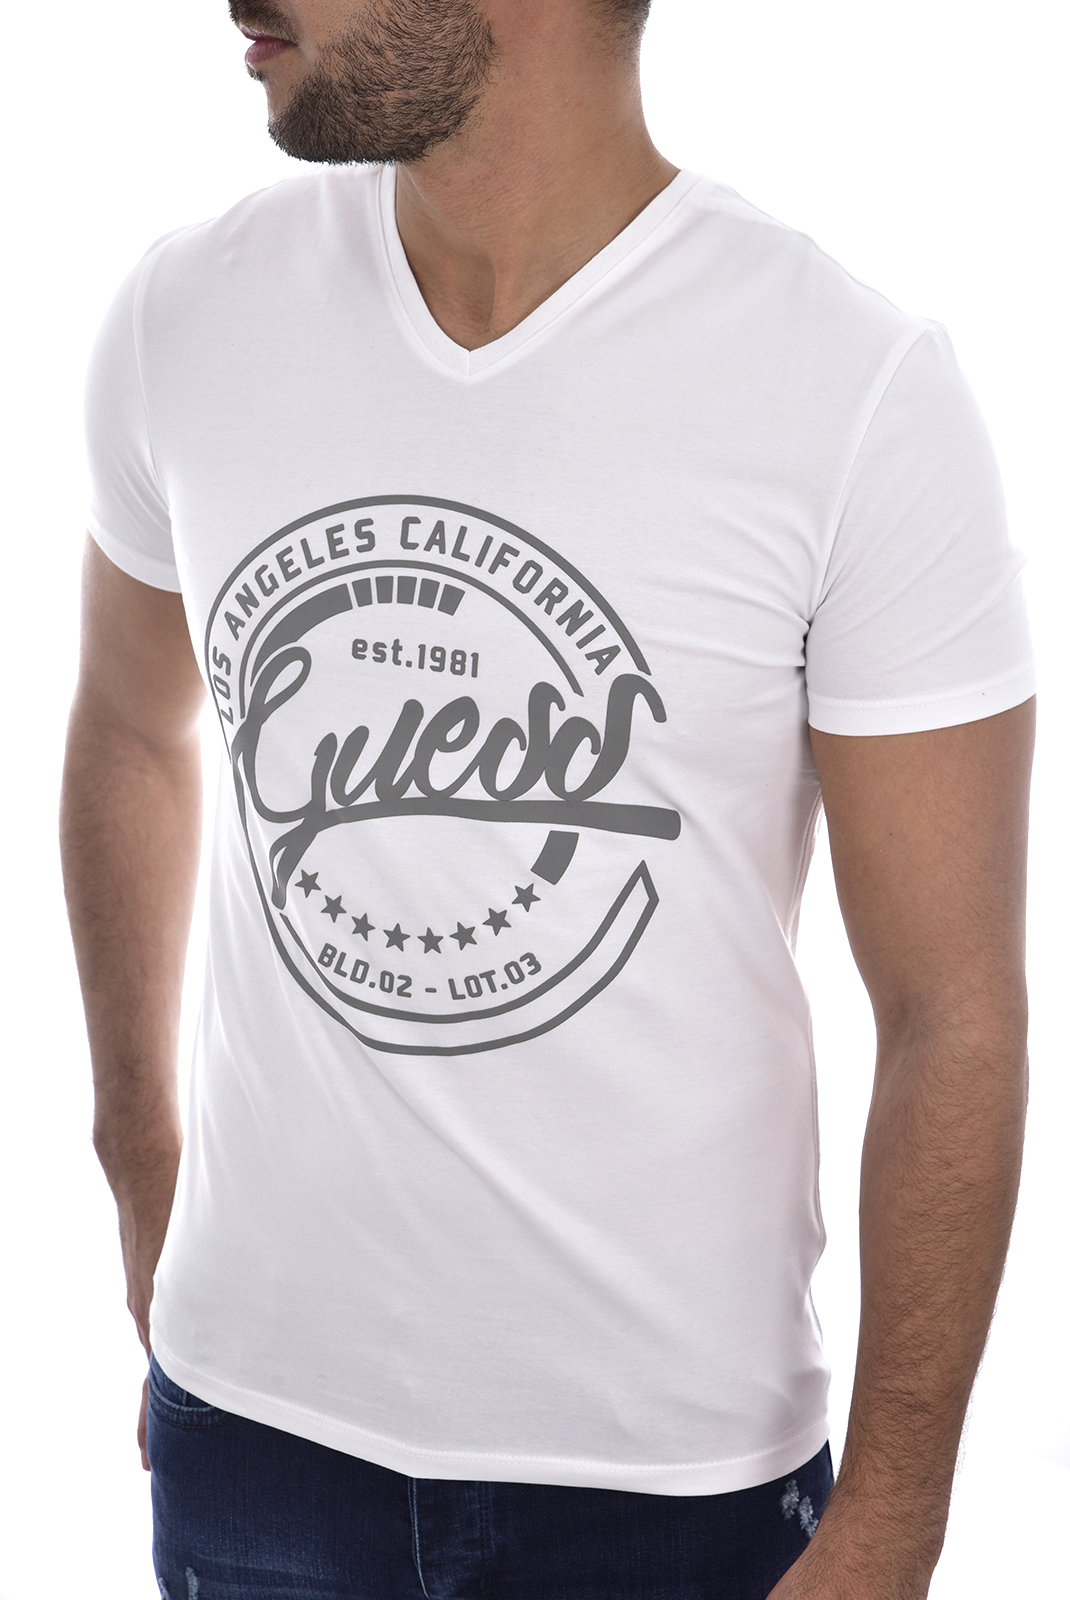 Tee-shirts  Guess jeans M83I25 J1300 TWHT